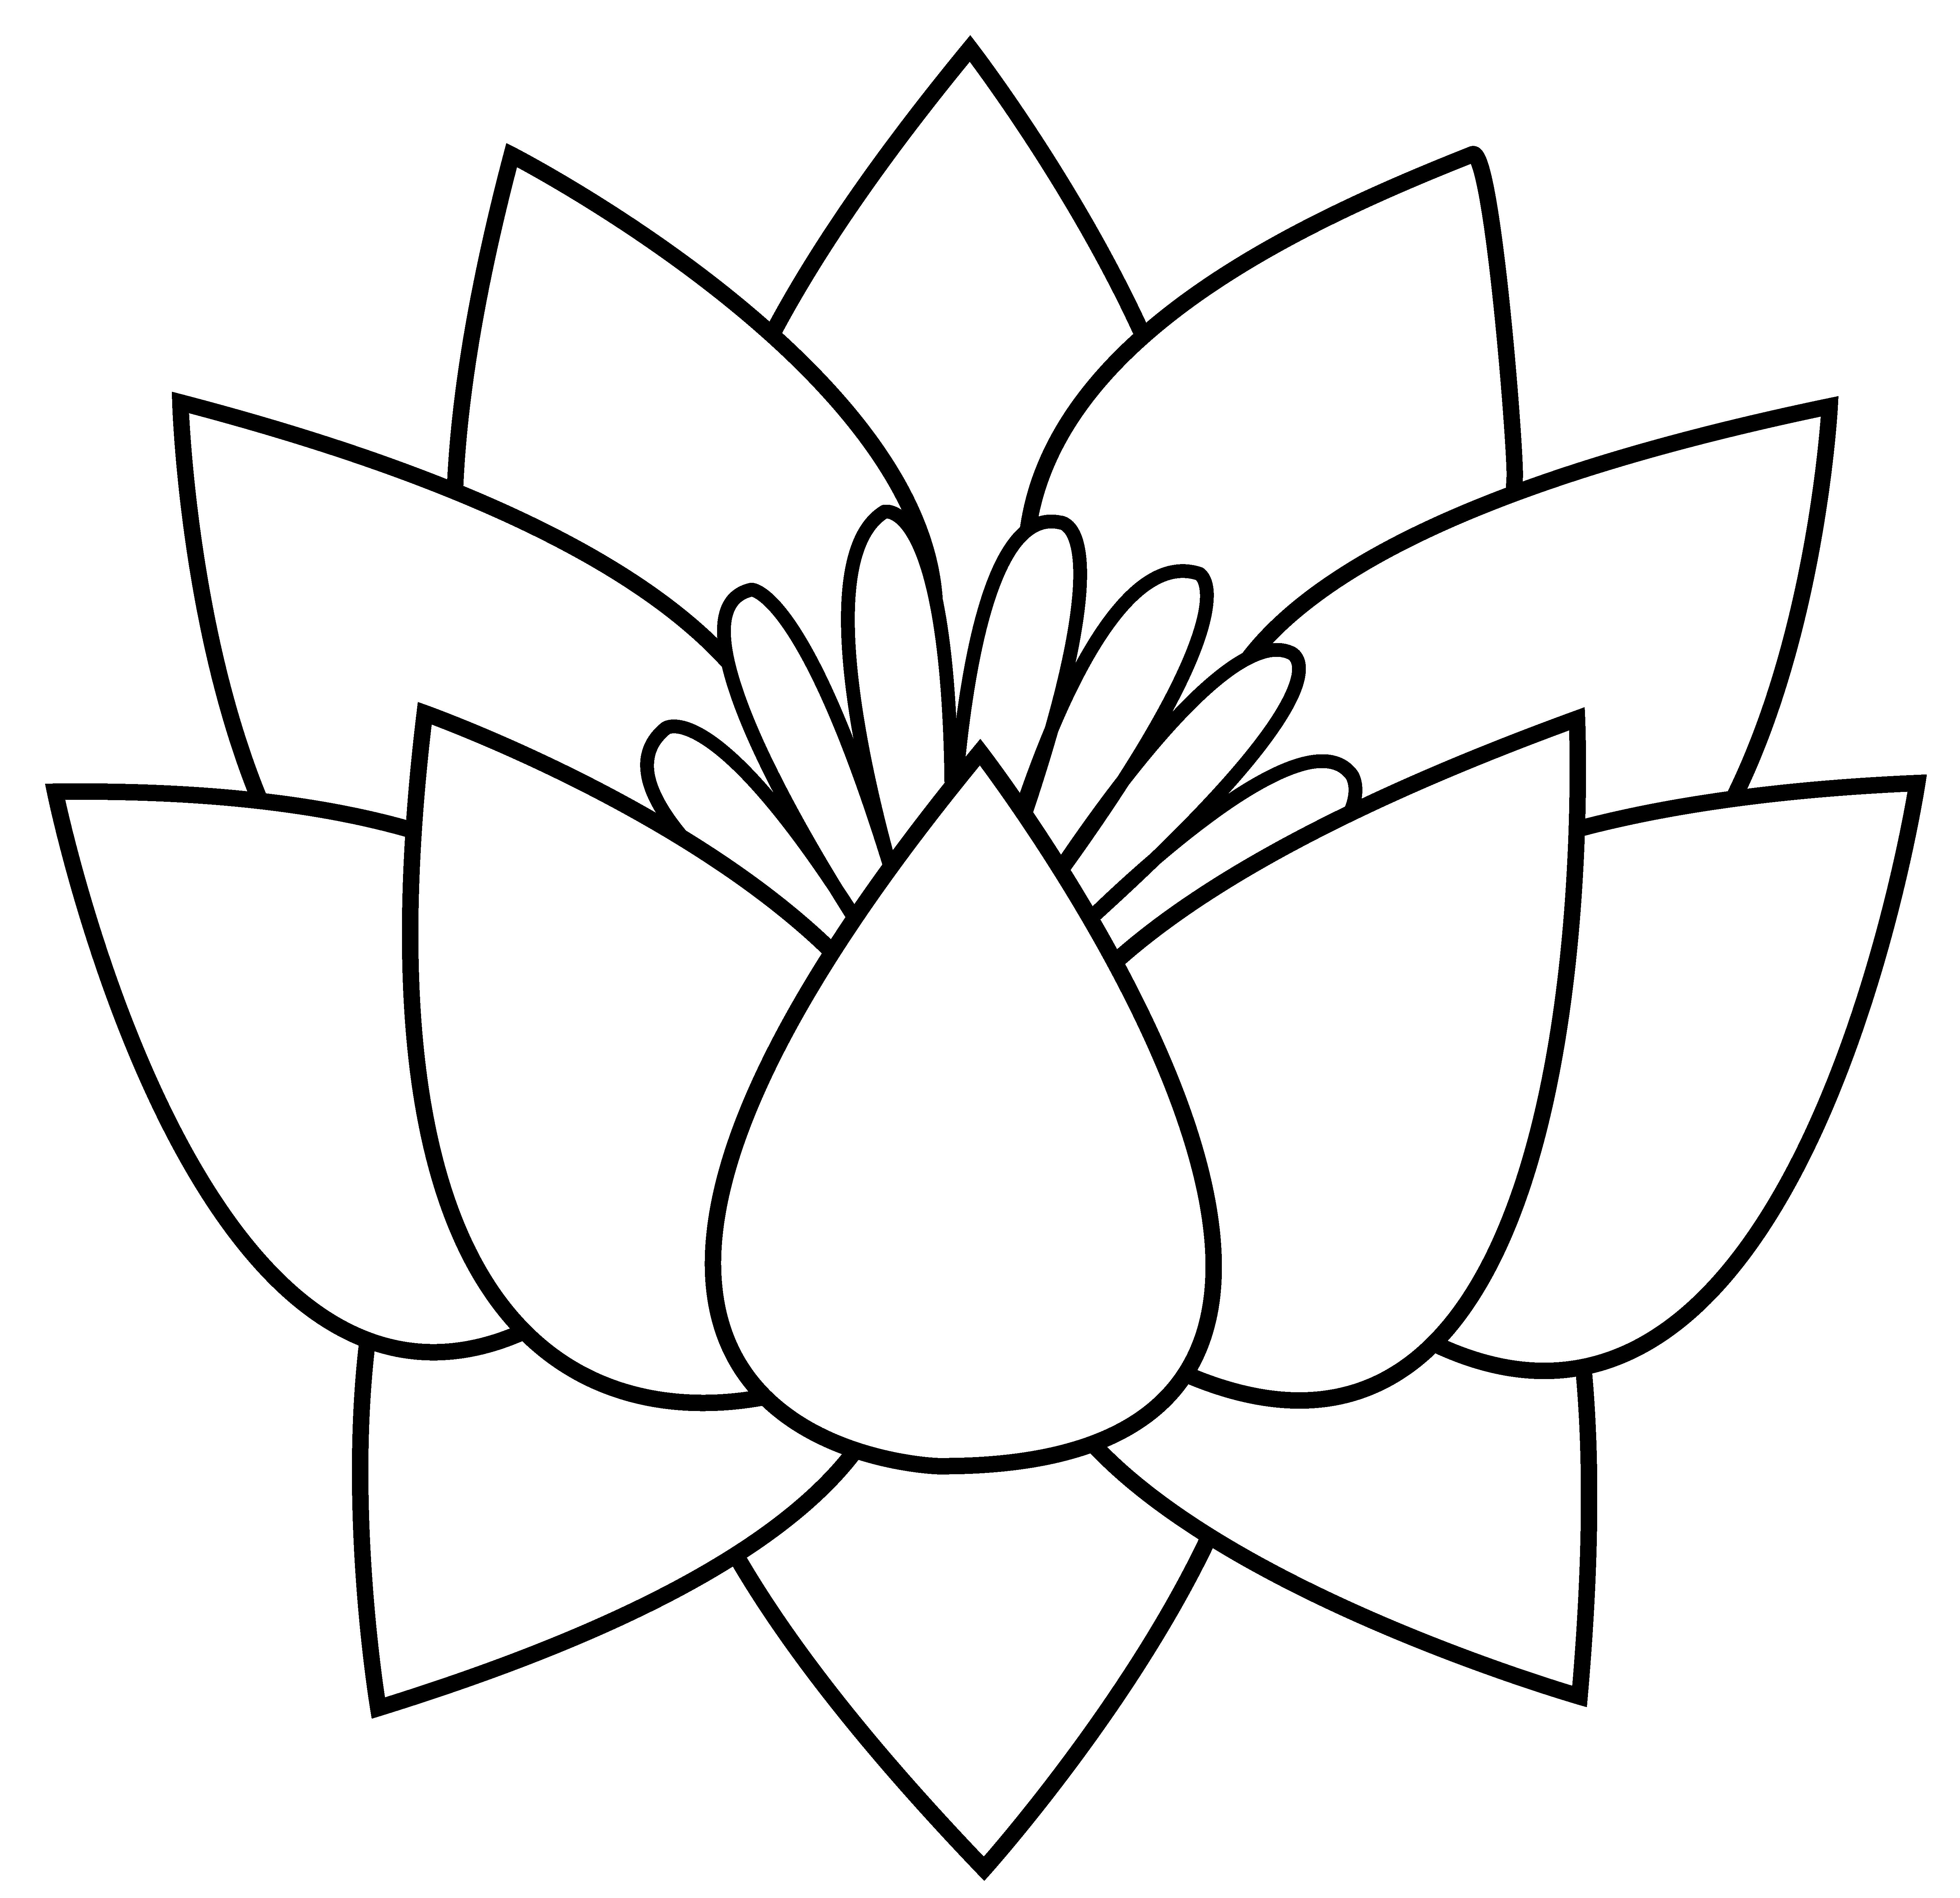 Lotus Flower Lineart Png 5953 5764 Flower Drawing Lotus Flower Drawing Lotus Flower Images